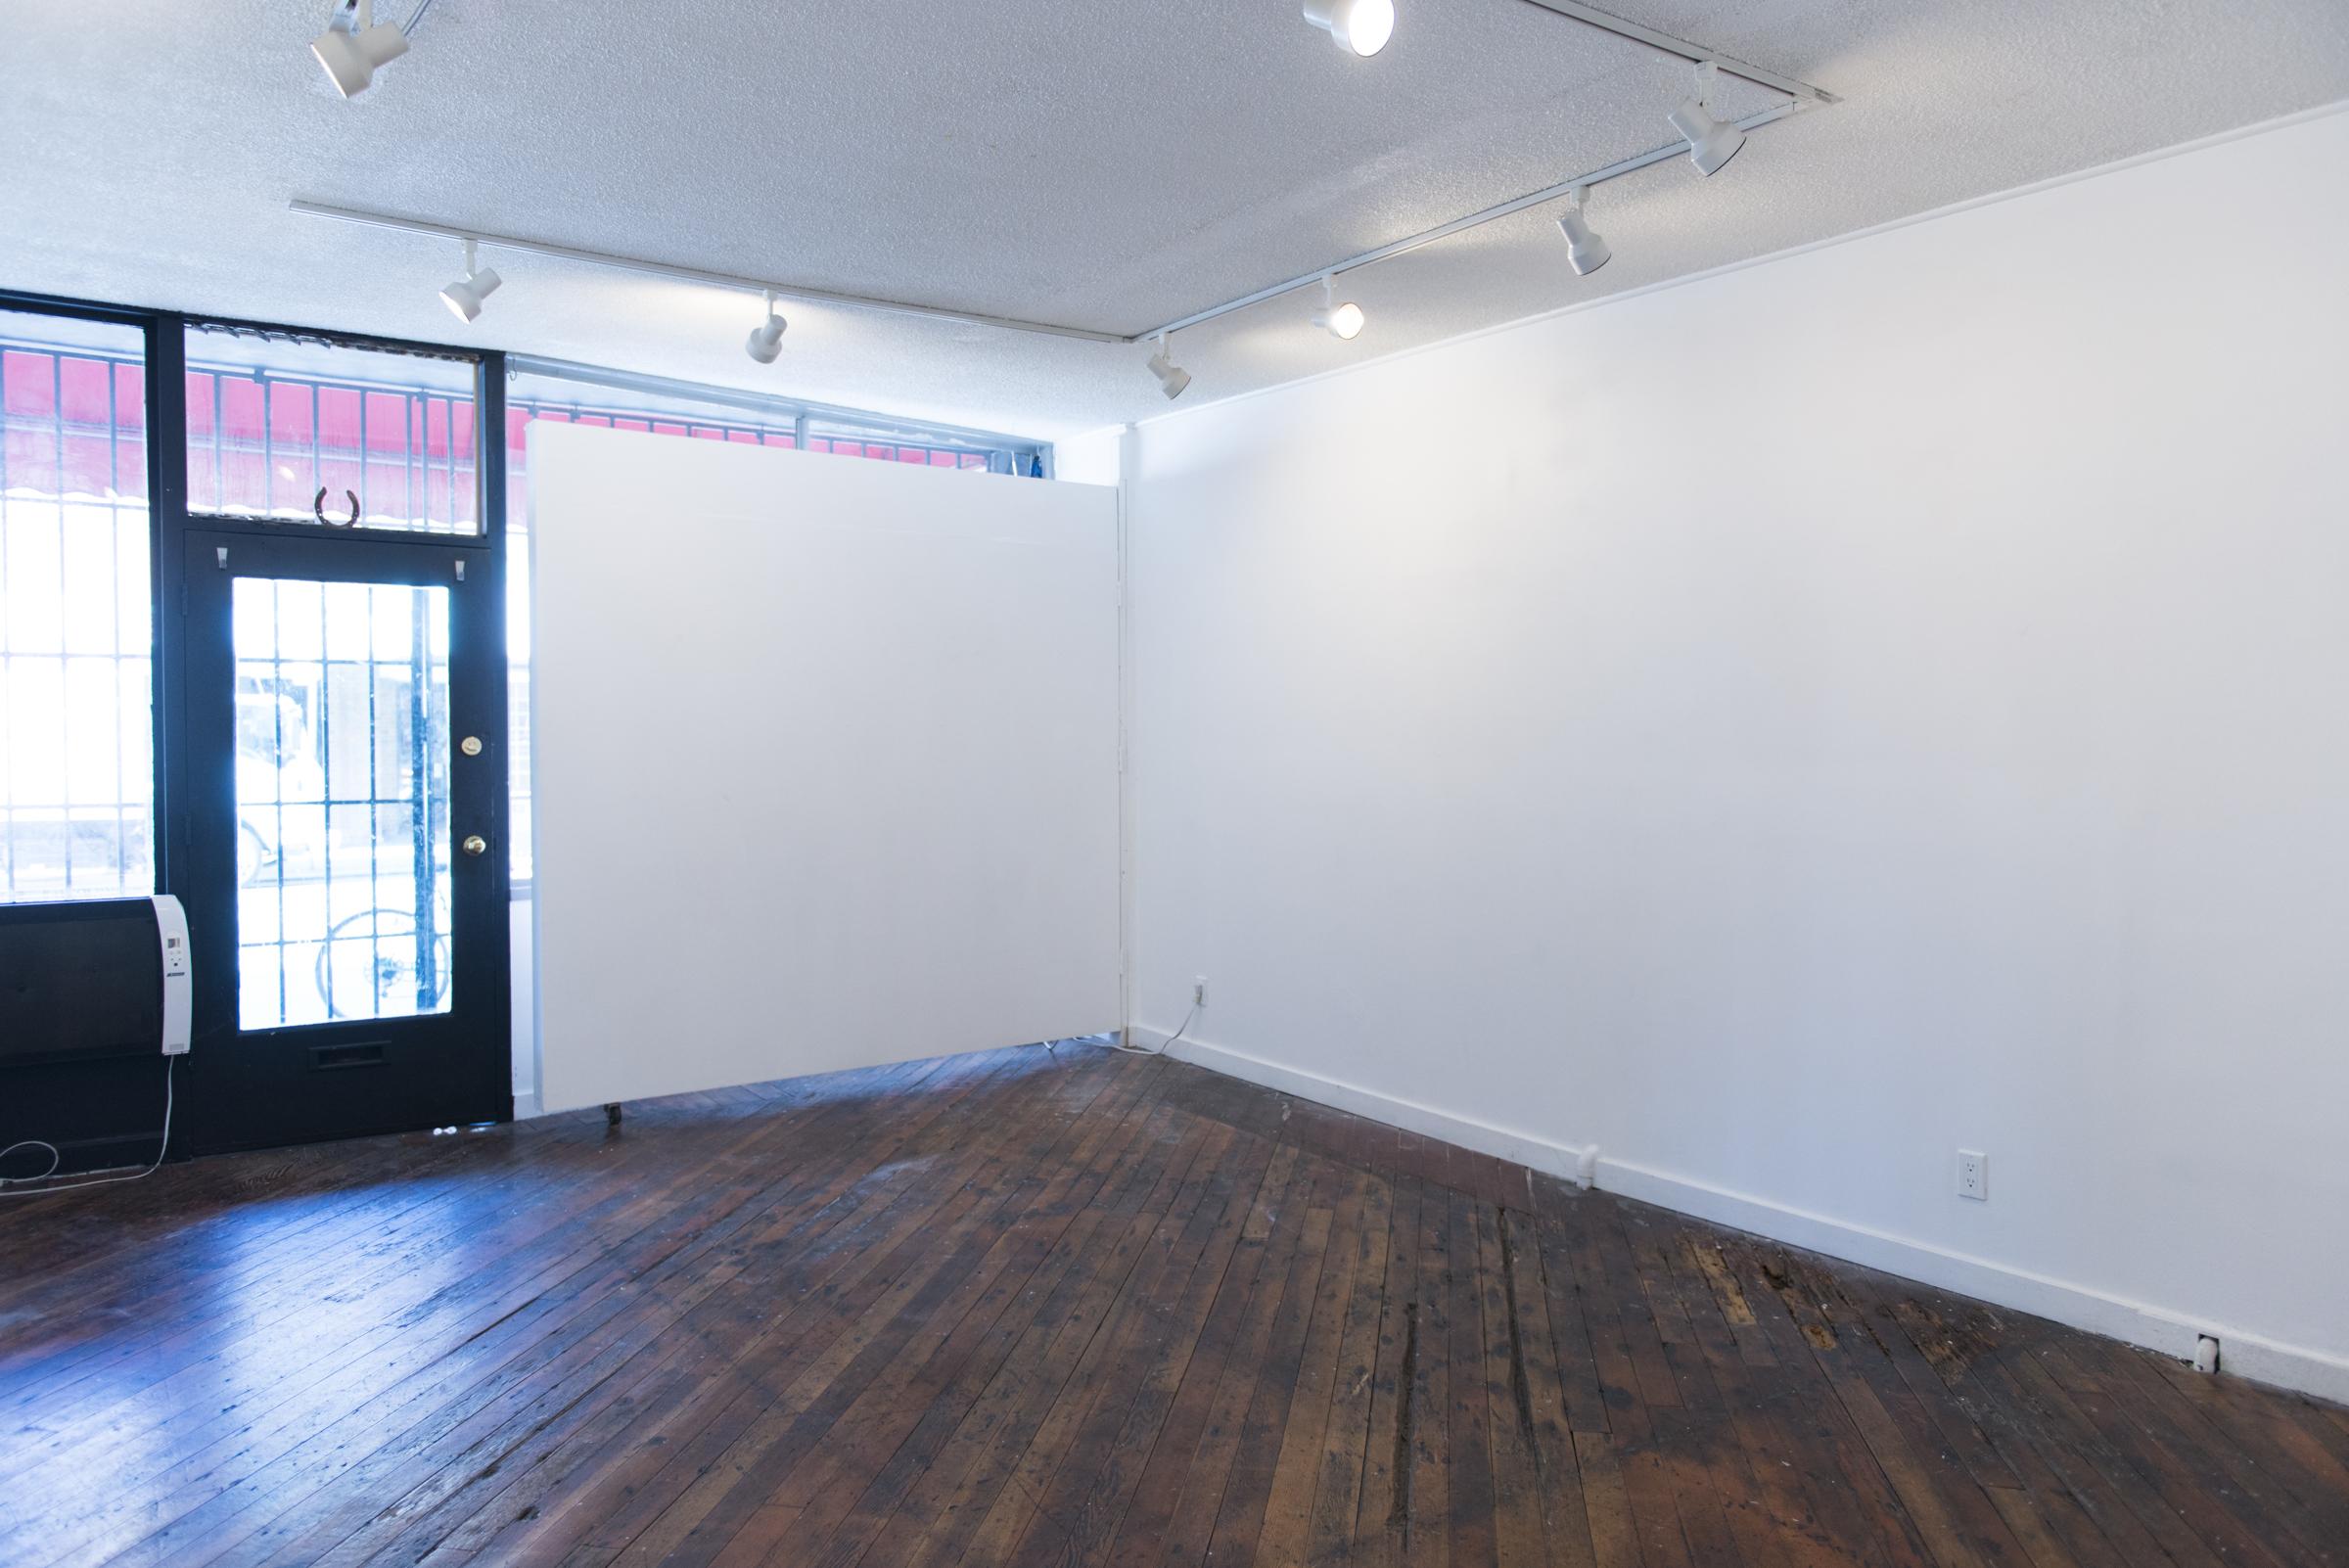 Untitled interior 6561